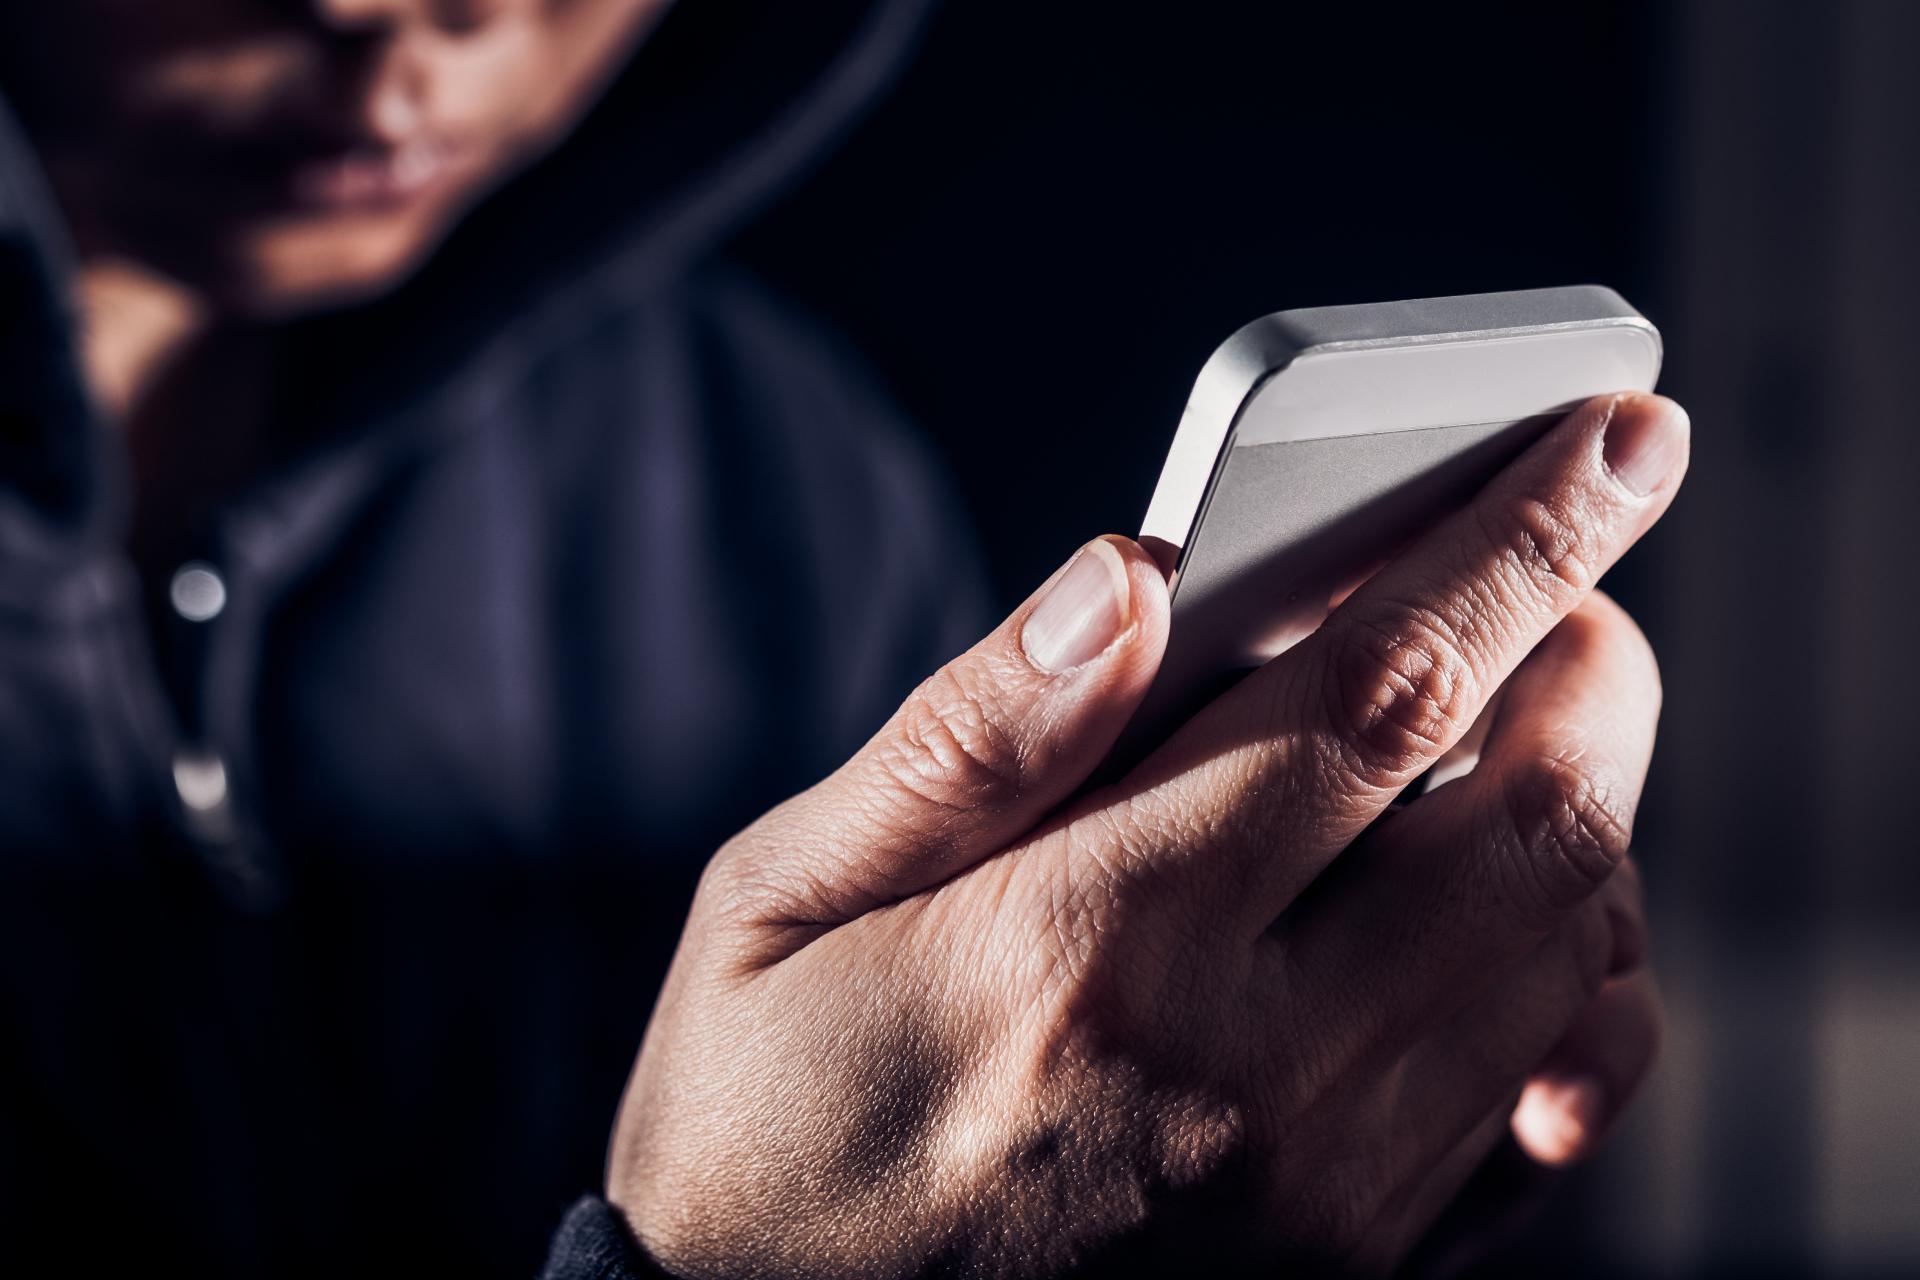 Davanje brojeva mobitela putem interneta